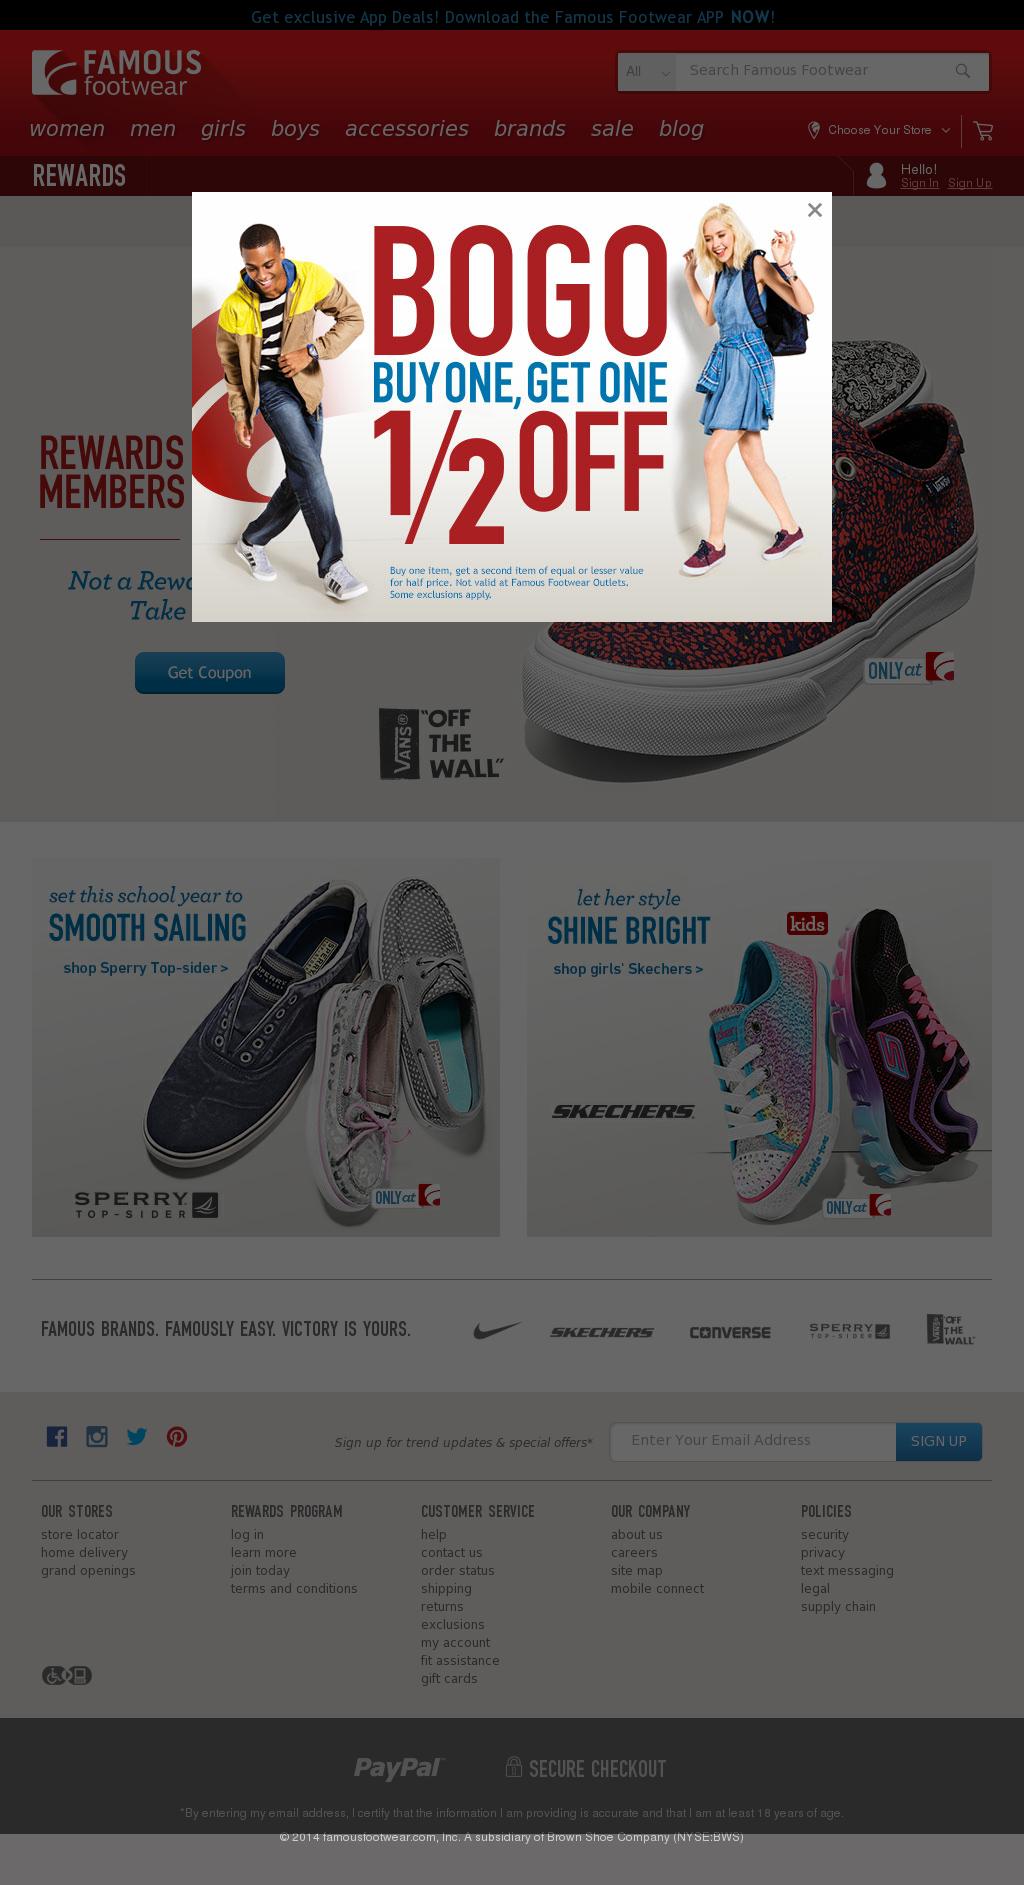 a8032a5cd6af Famous footwear Competitors